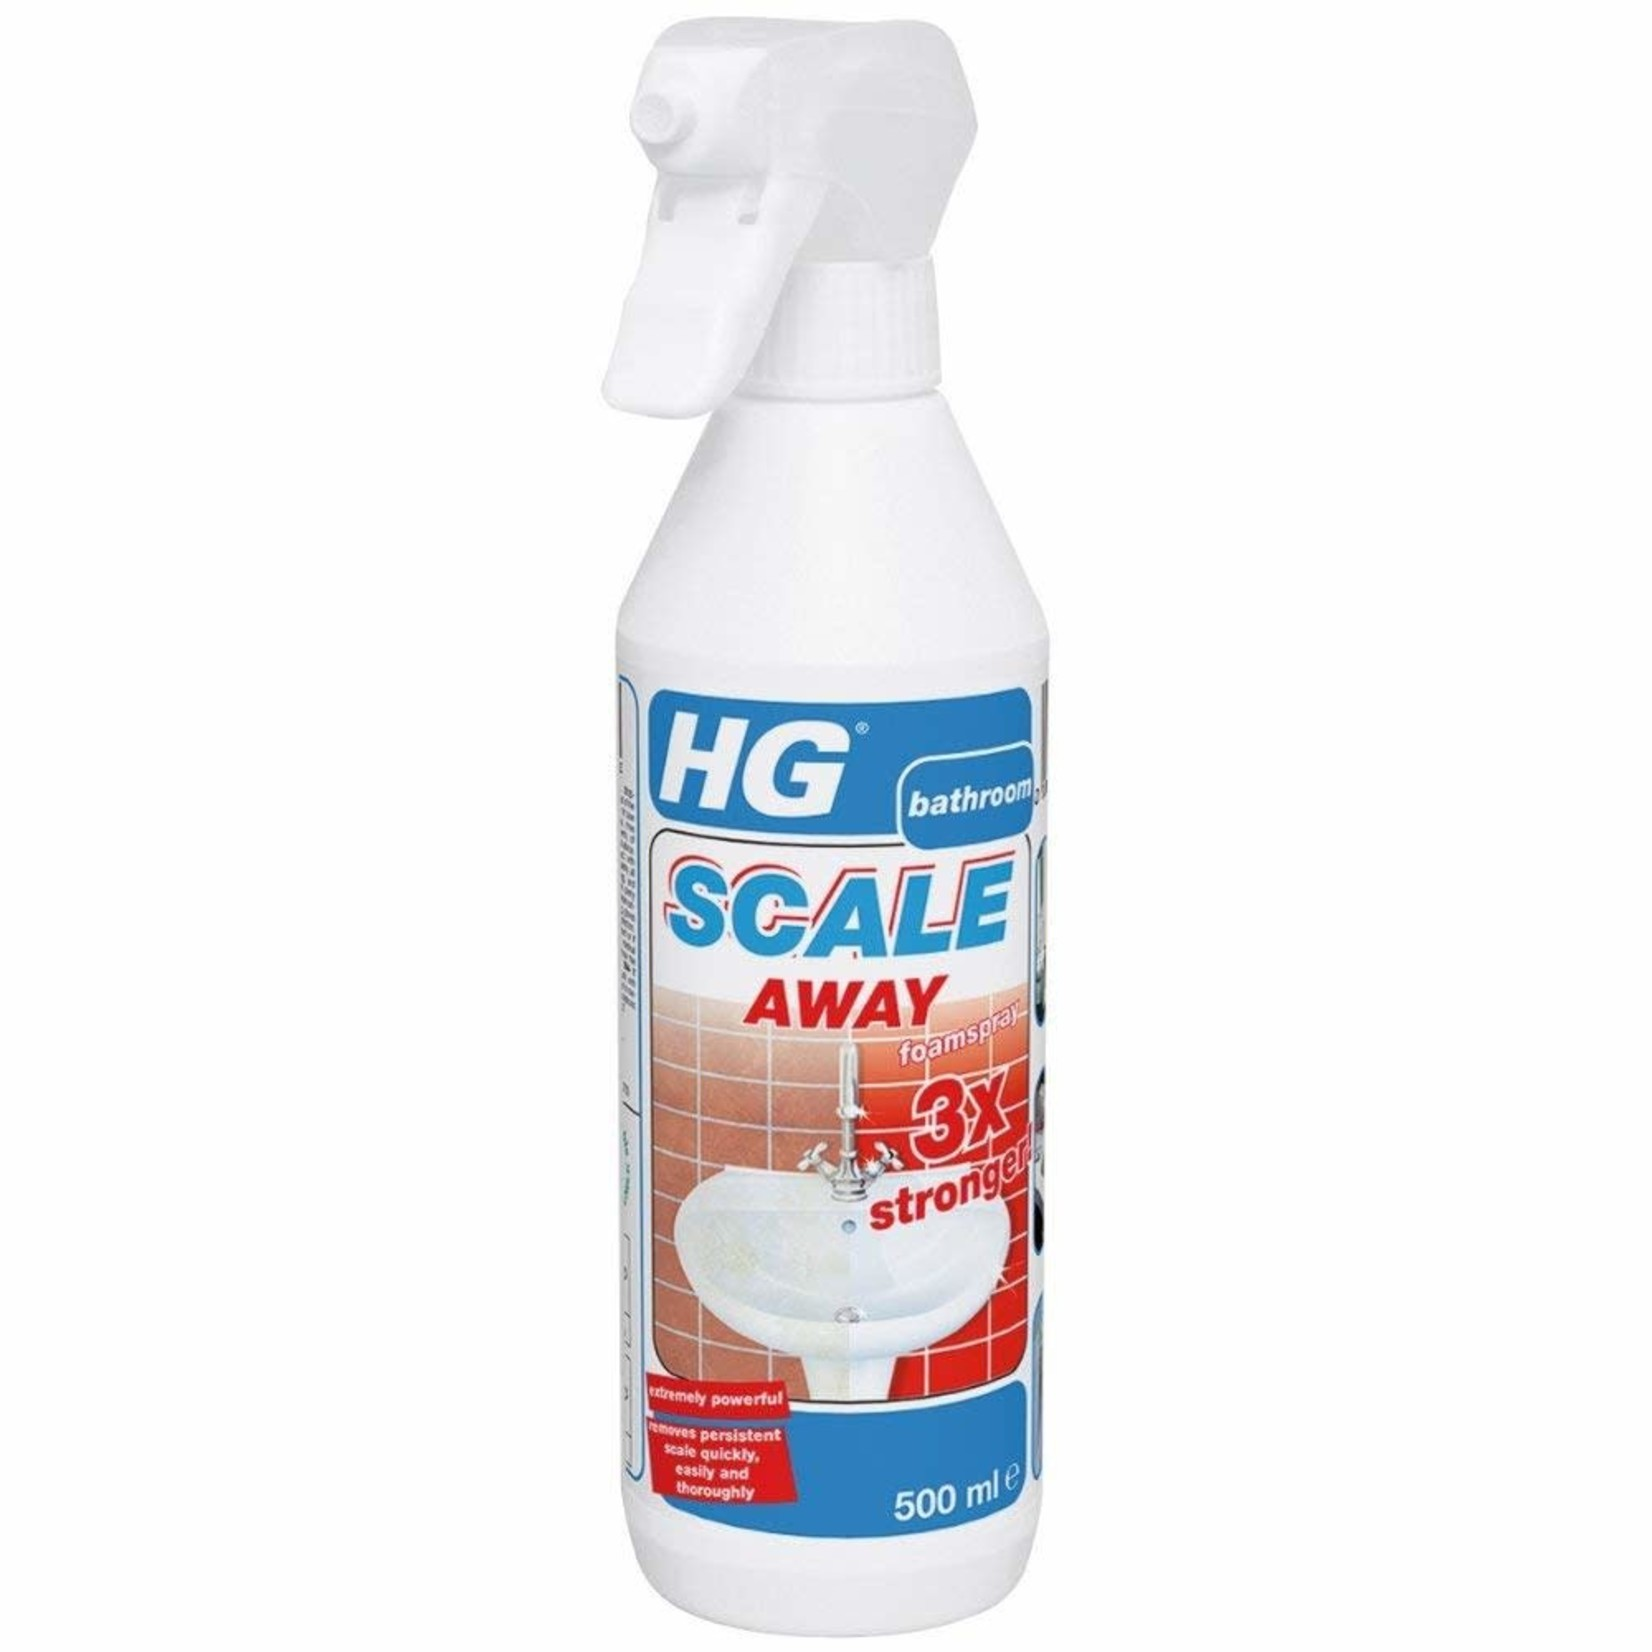 HG HG SCALE AWAY 3X STRONGER FOAM SPRAY BATHROOM